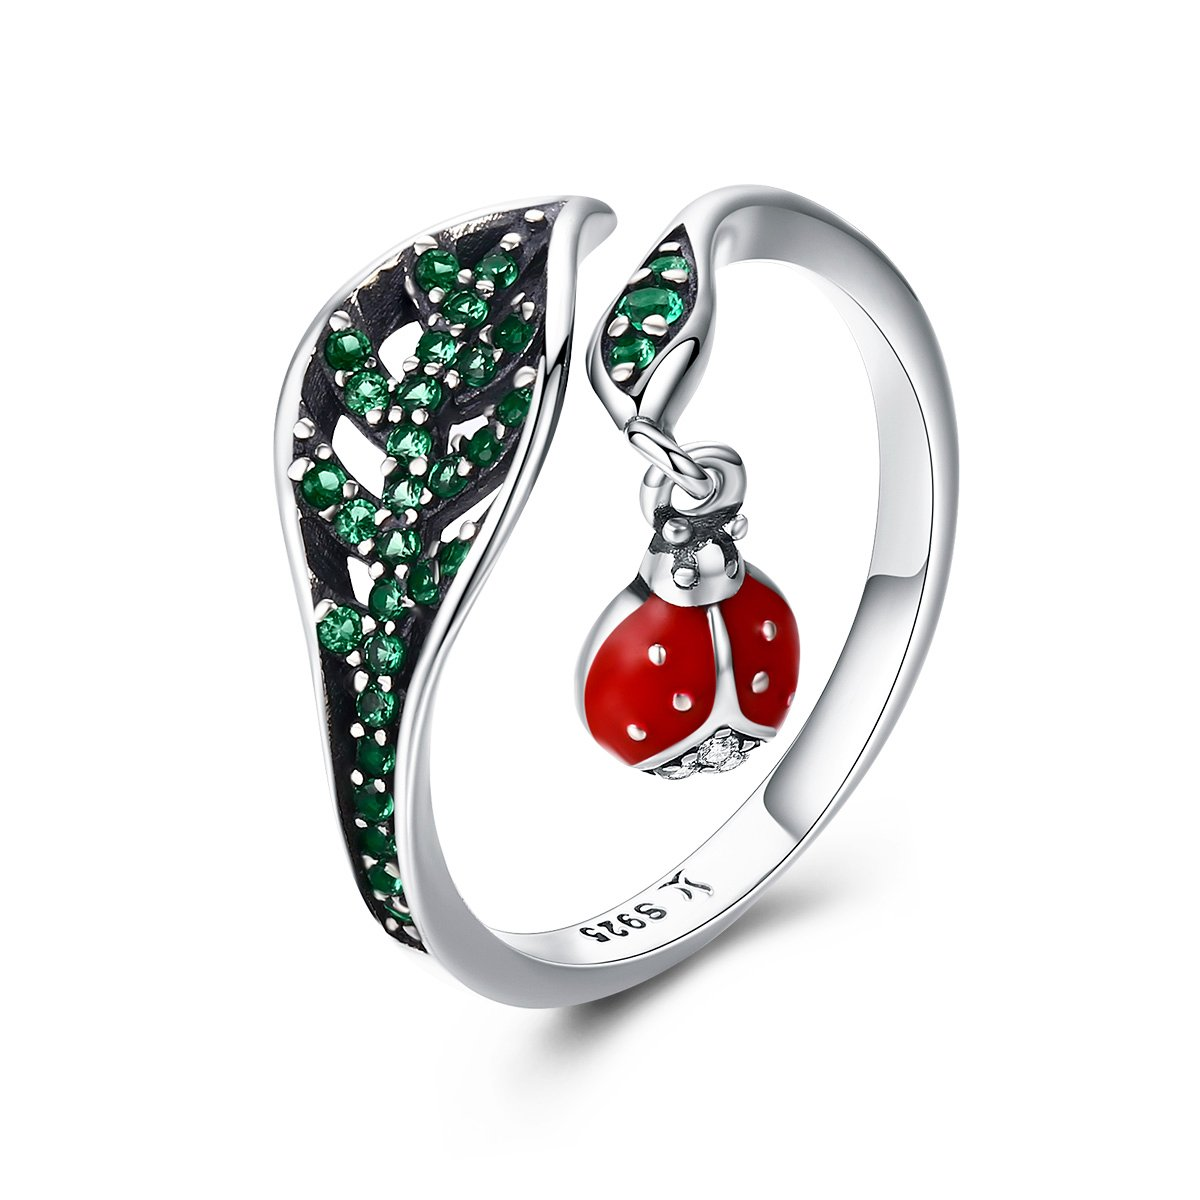 WOSTU 925 Sterling Silver Dazzling Green Cubic Zircon Leaf Wrap Bands Rings Lovely Ladybug Enamel Rings